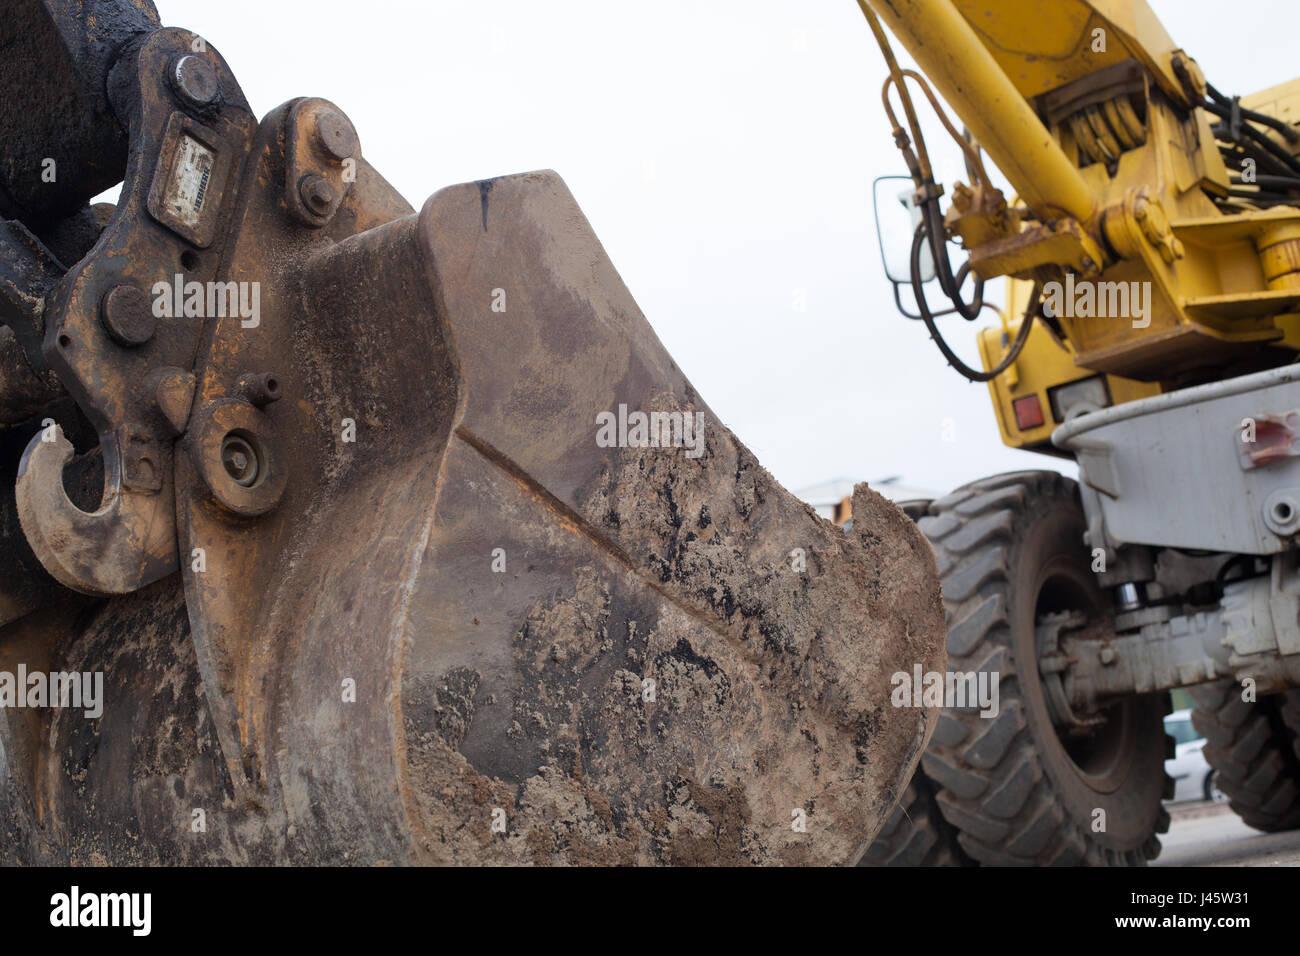 Dirty bucket of an excavator. Stock Photo